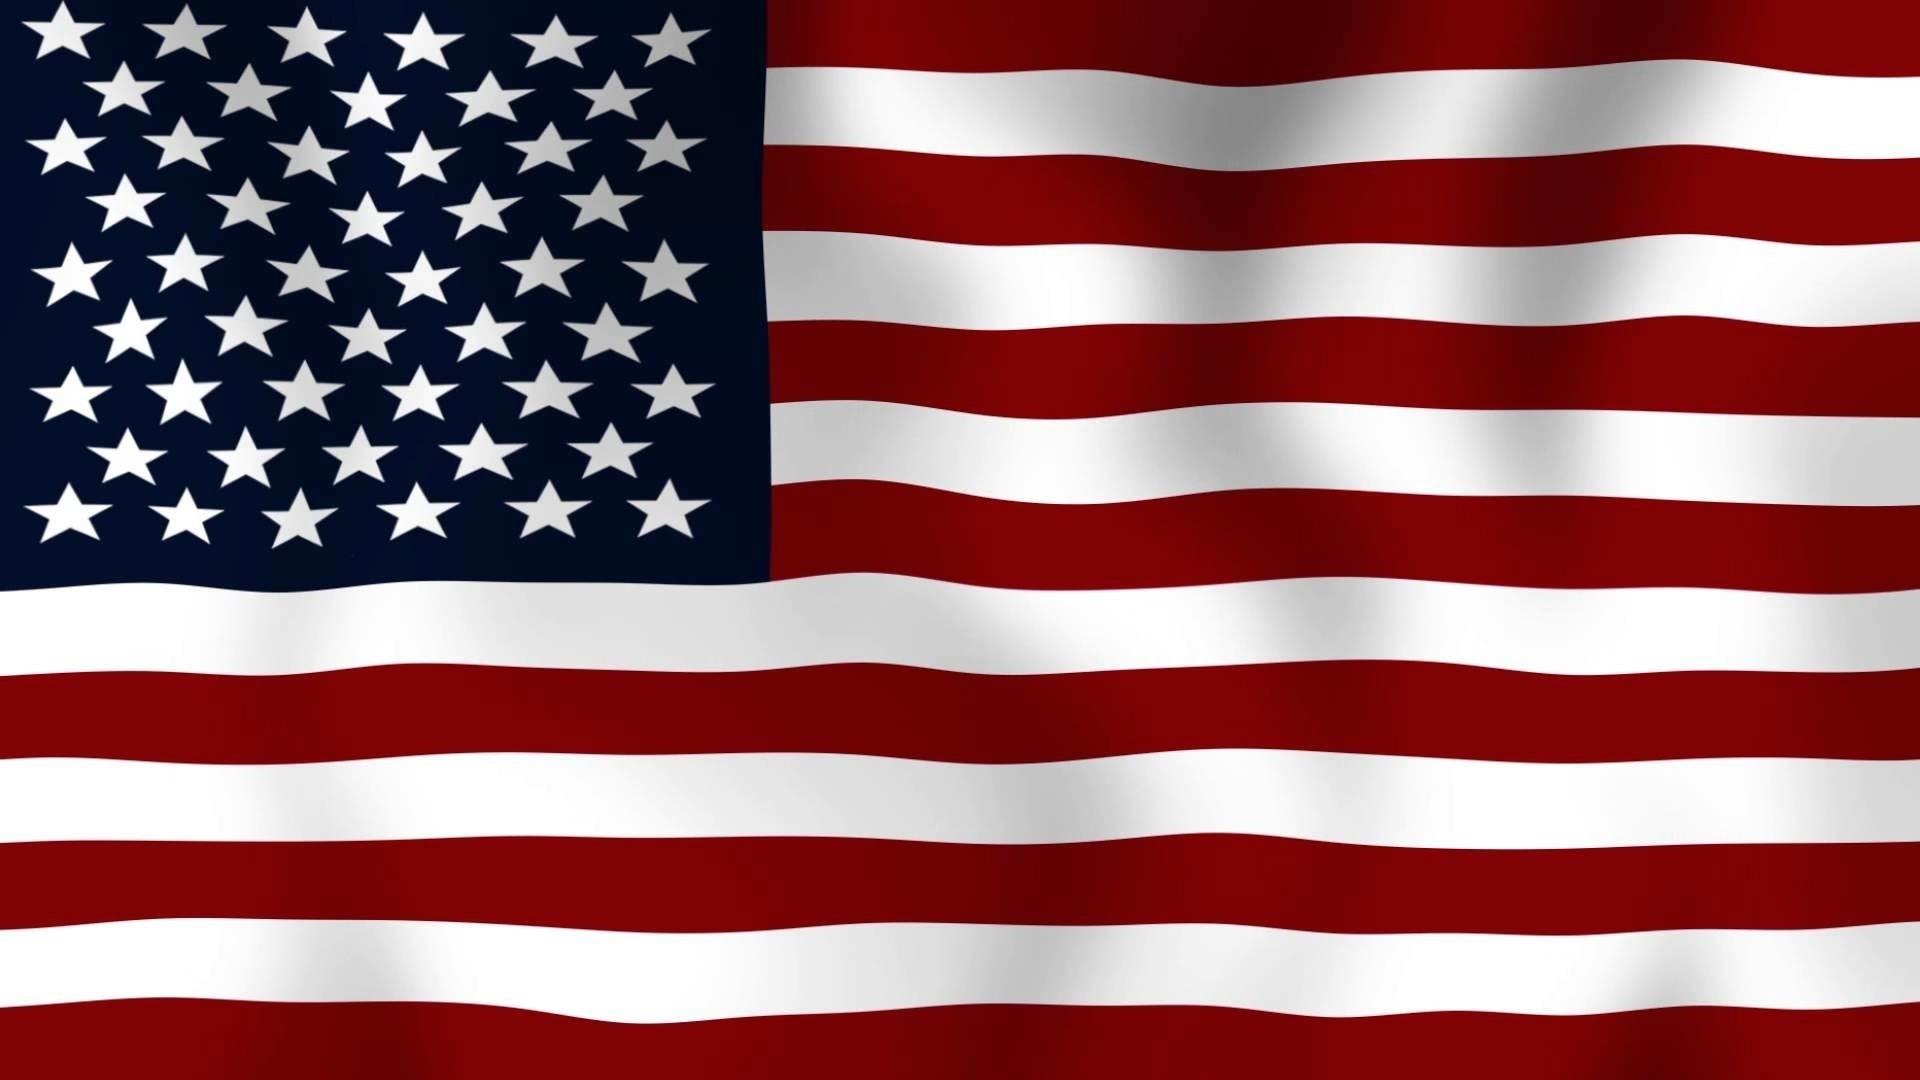 Patriotic HD Wallpaper